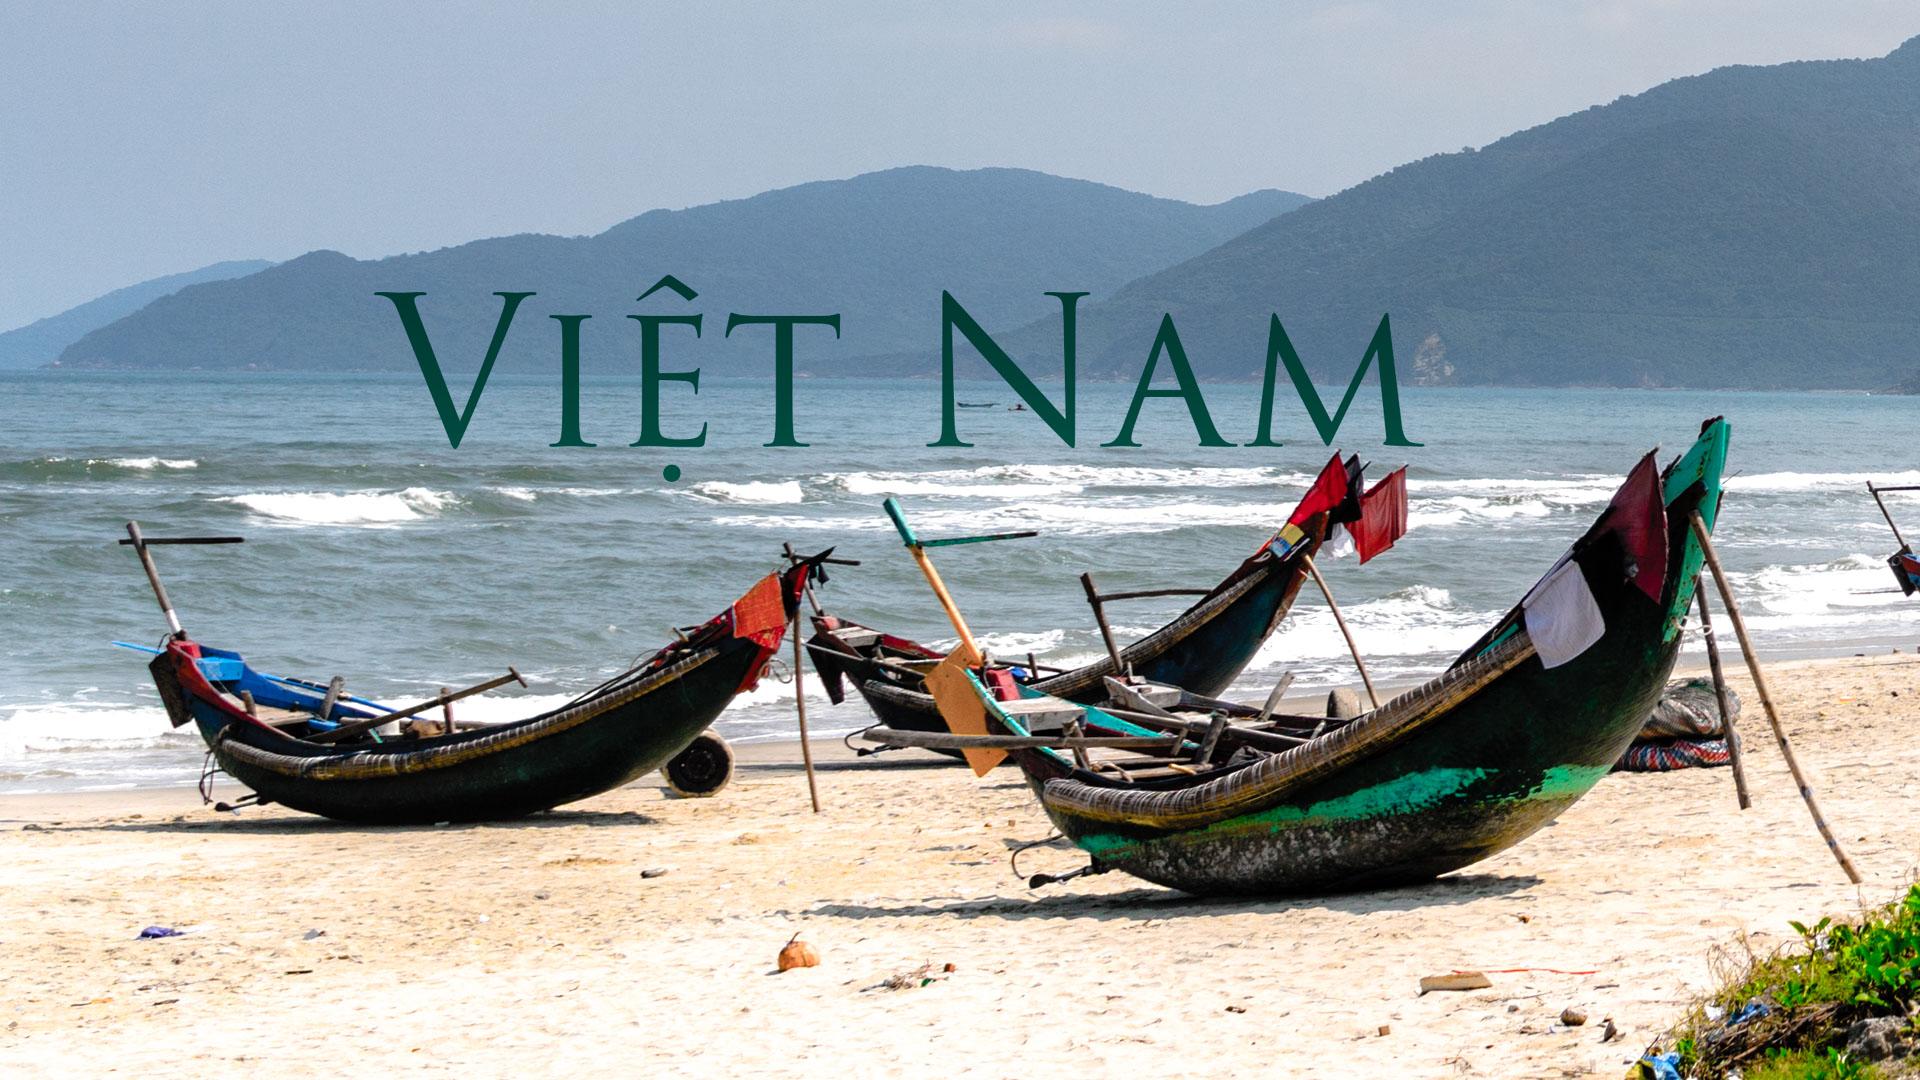 SerialHikers stop autostop world monde tour hitchhiking aventure adventure alternative travel voyage sans avion no fly vietnam guide